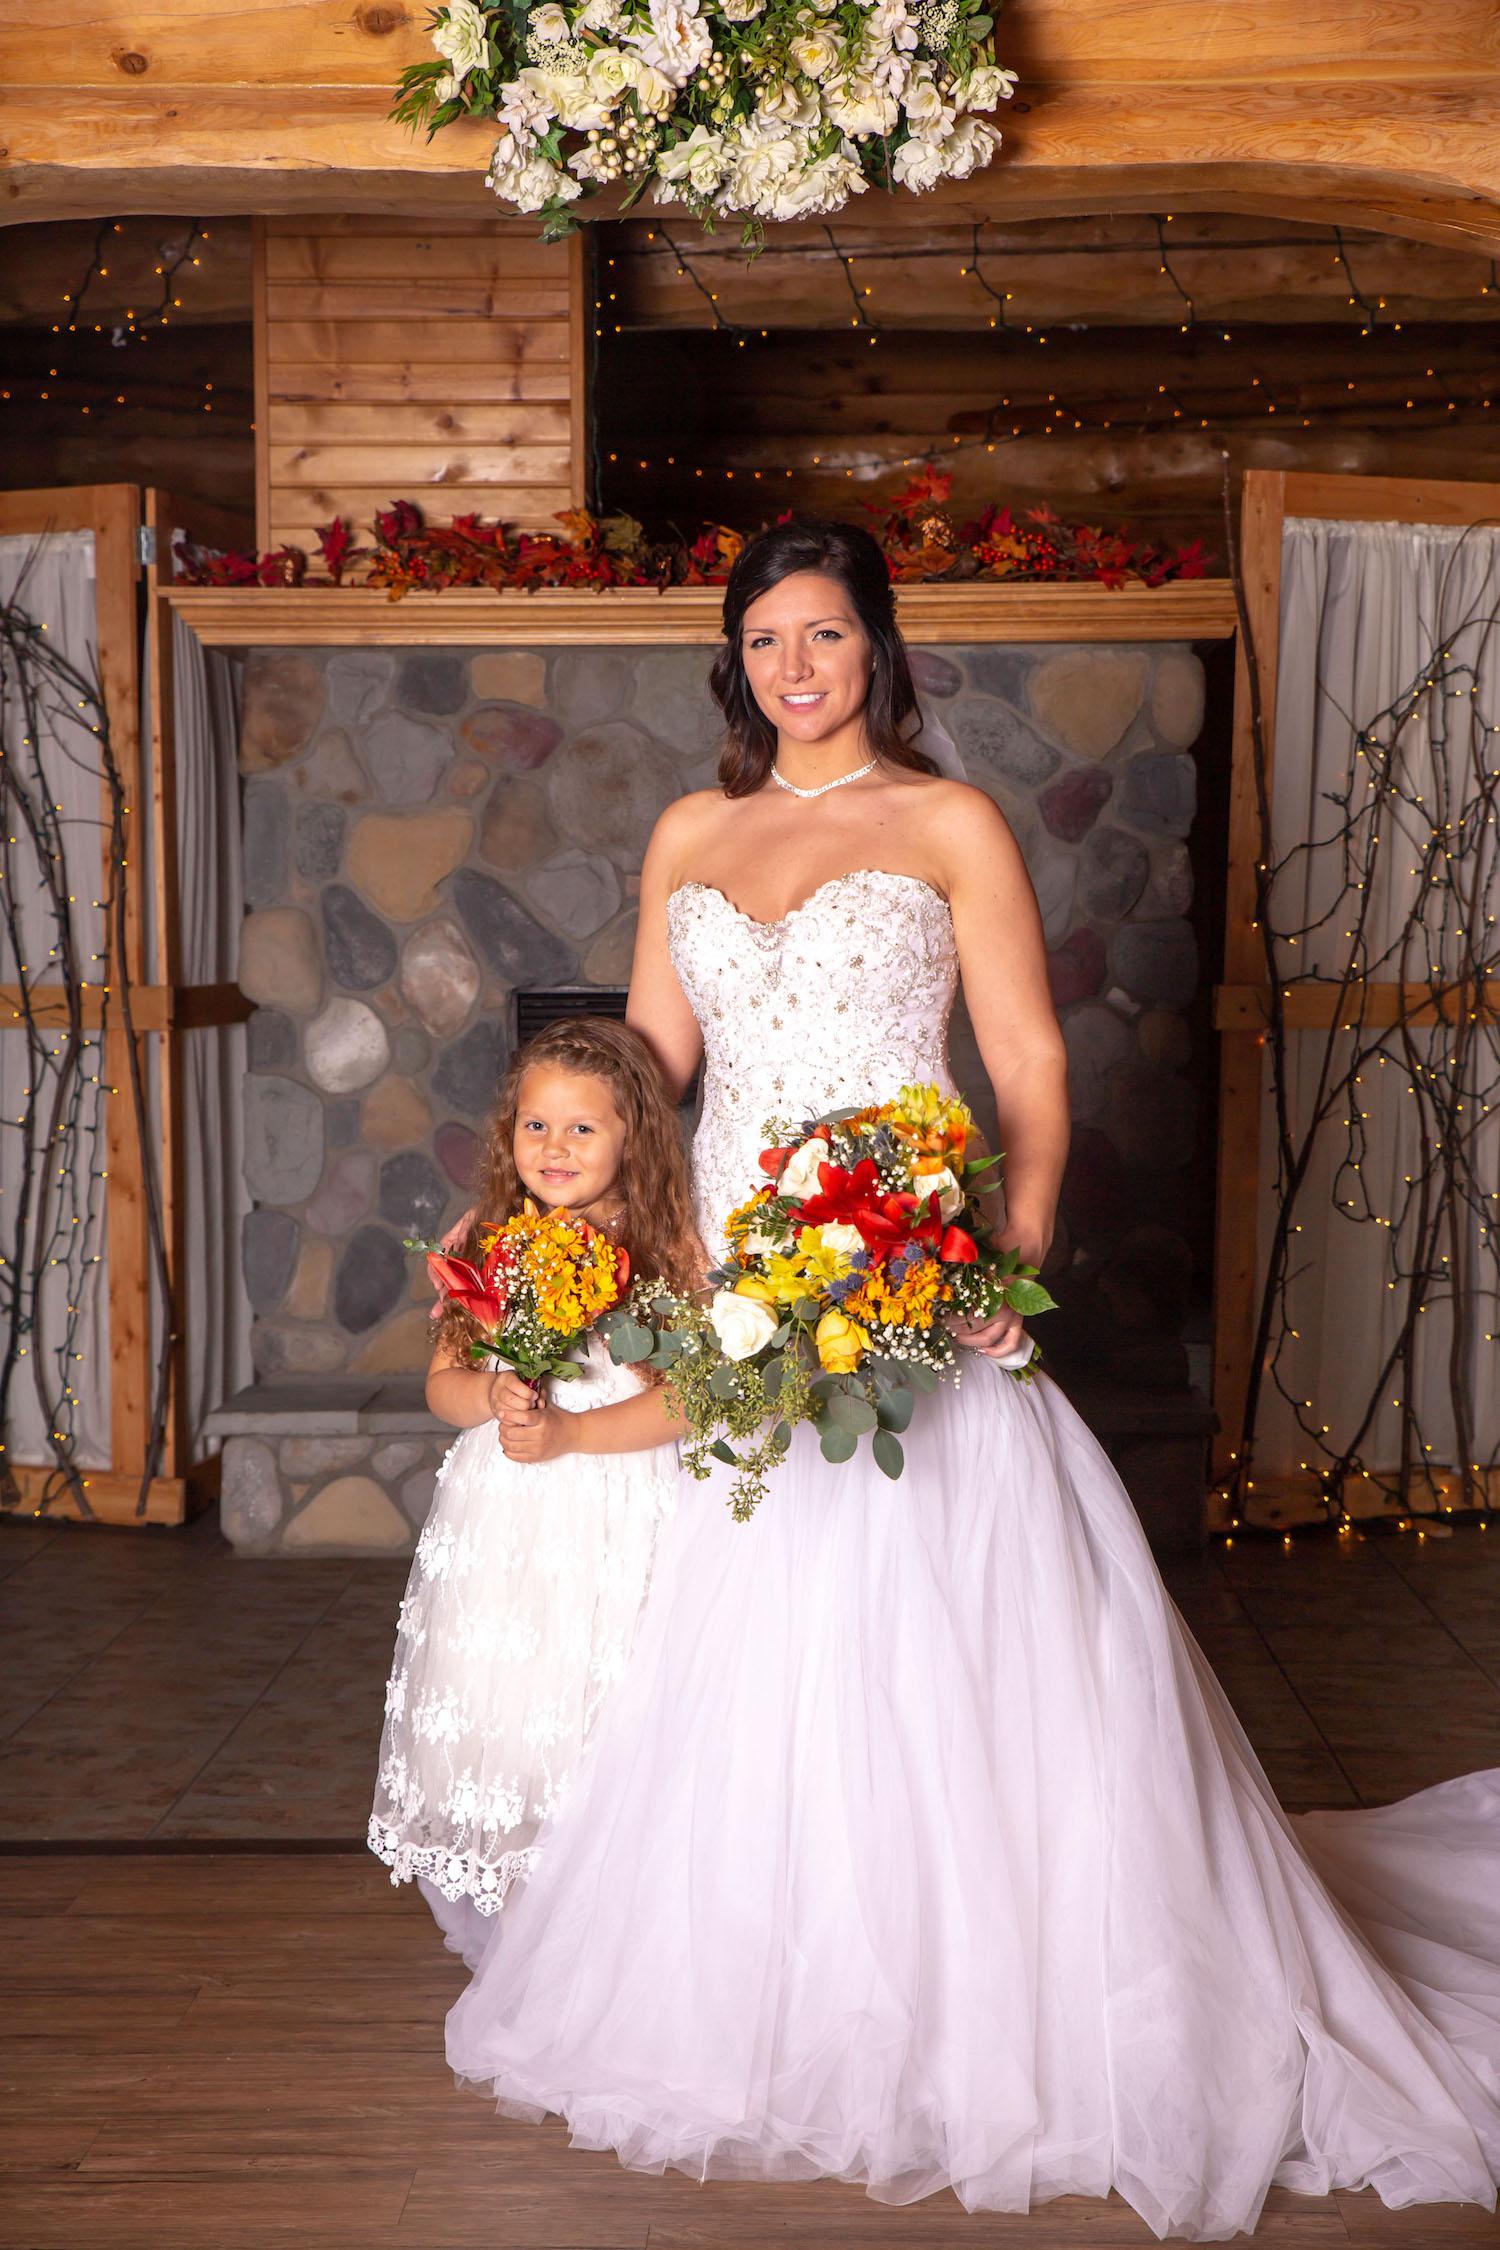 Glenhaven winter Minnesota wedding rustic barn, orange and yellow bouquet, flower girl photo